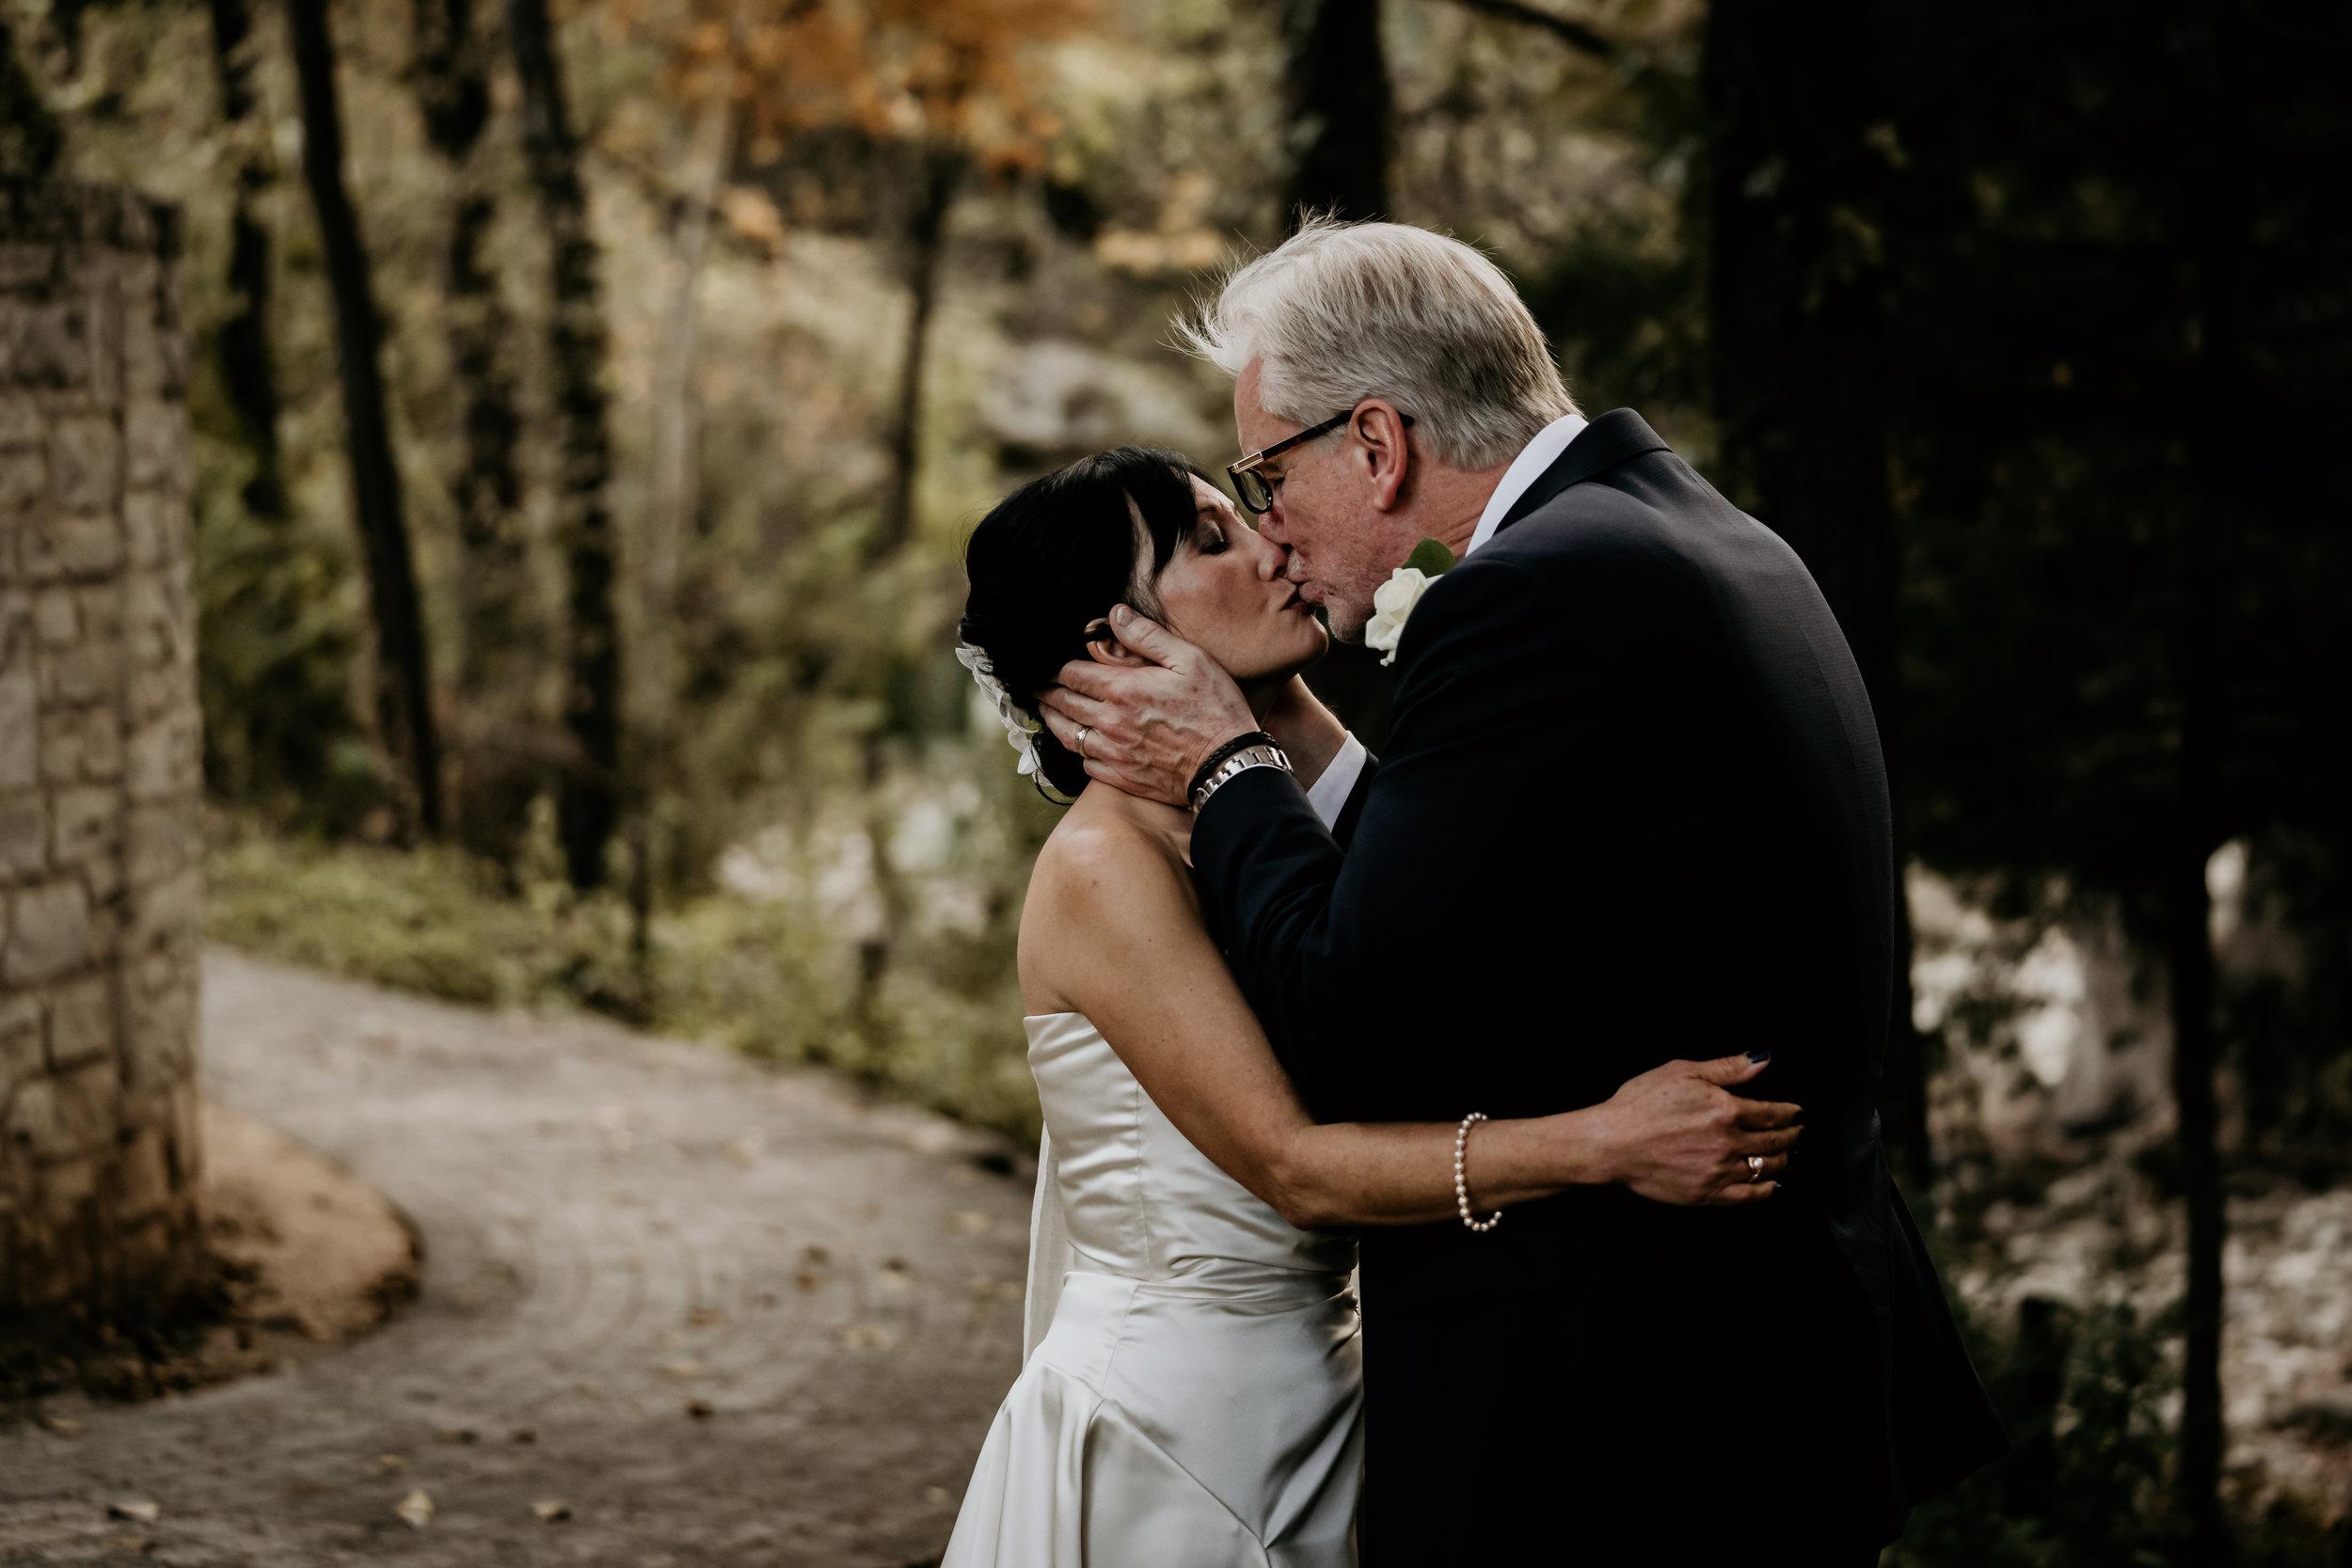 20181124-20181124-St. Martin Wedding-512.jpg